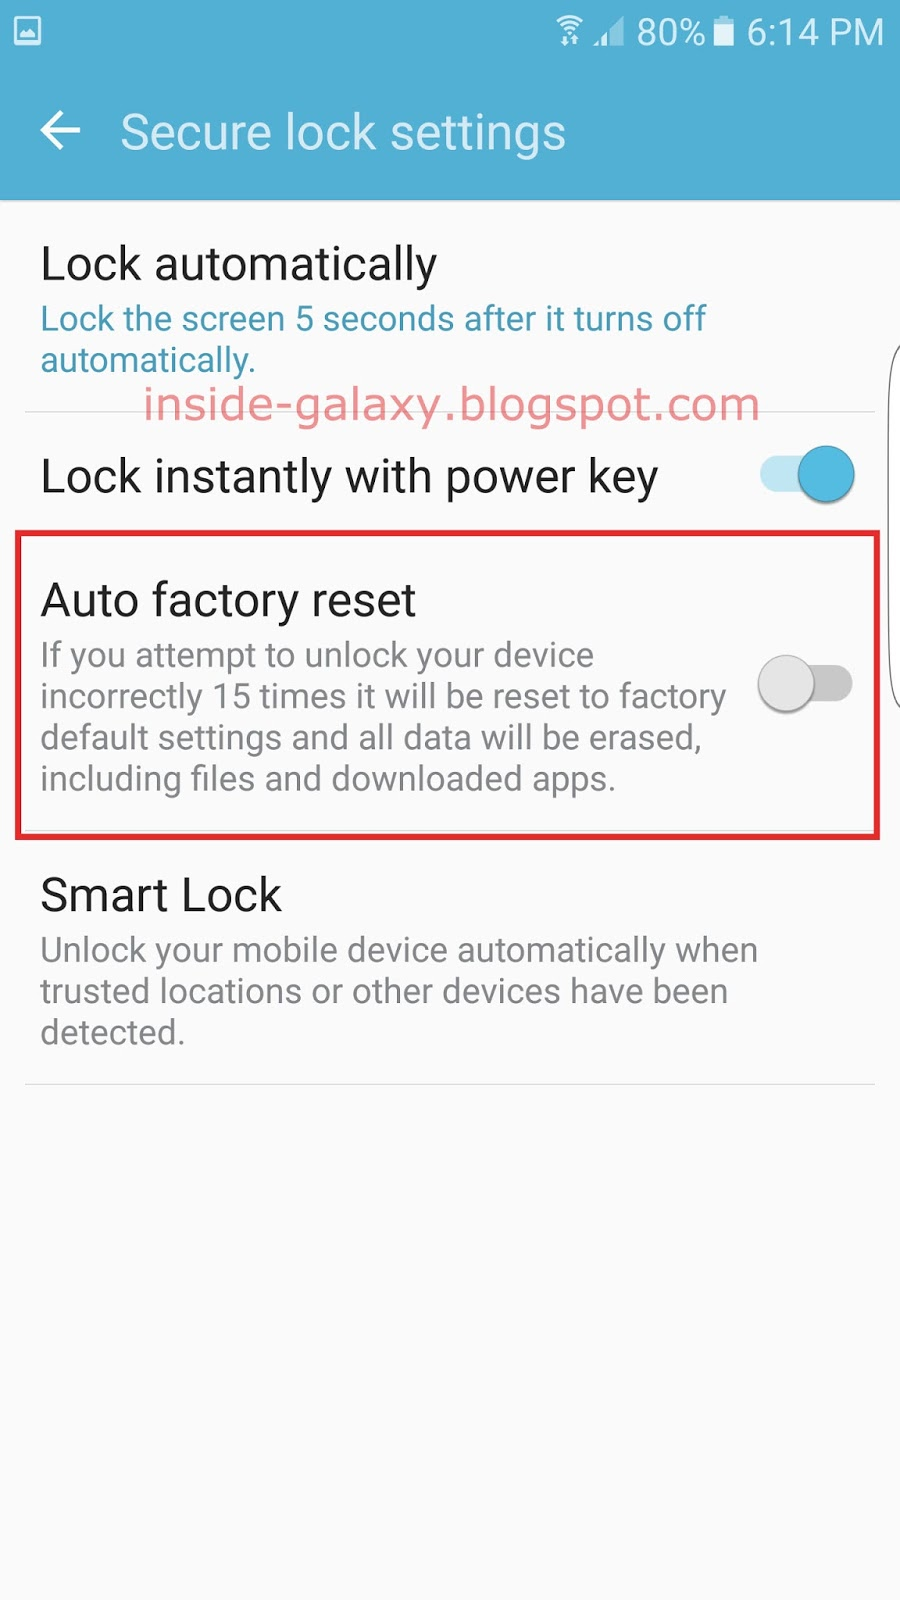 Samsung galaxy s7 edge screen auto rotate off alarm 14